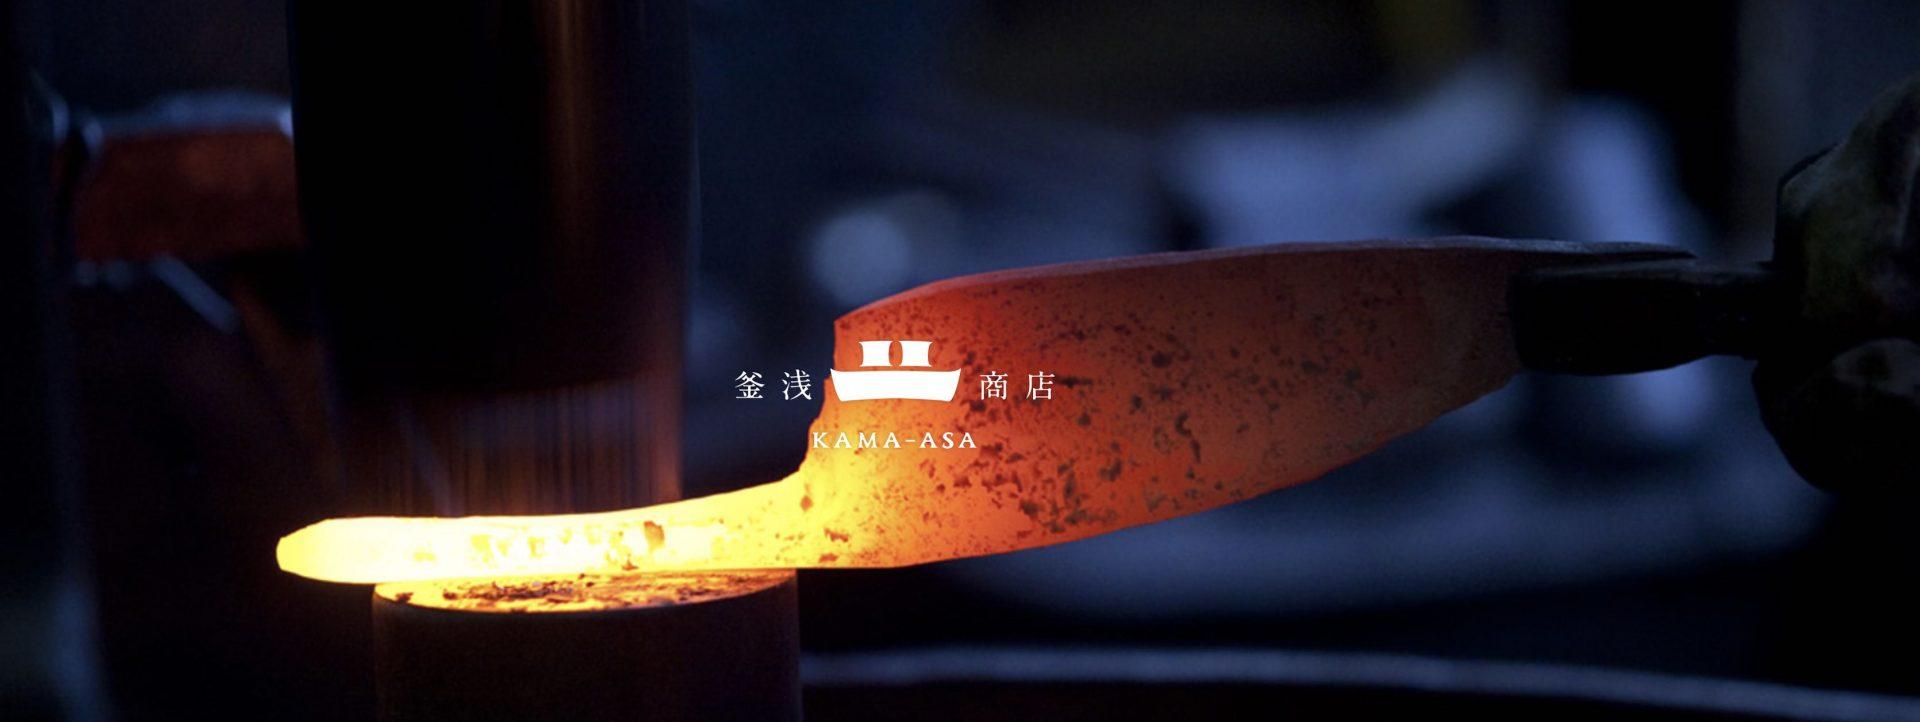 Senmonten Knife Kama Asa